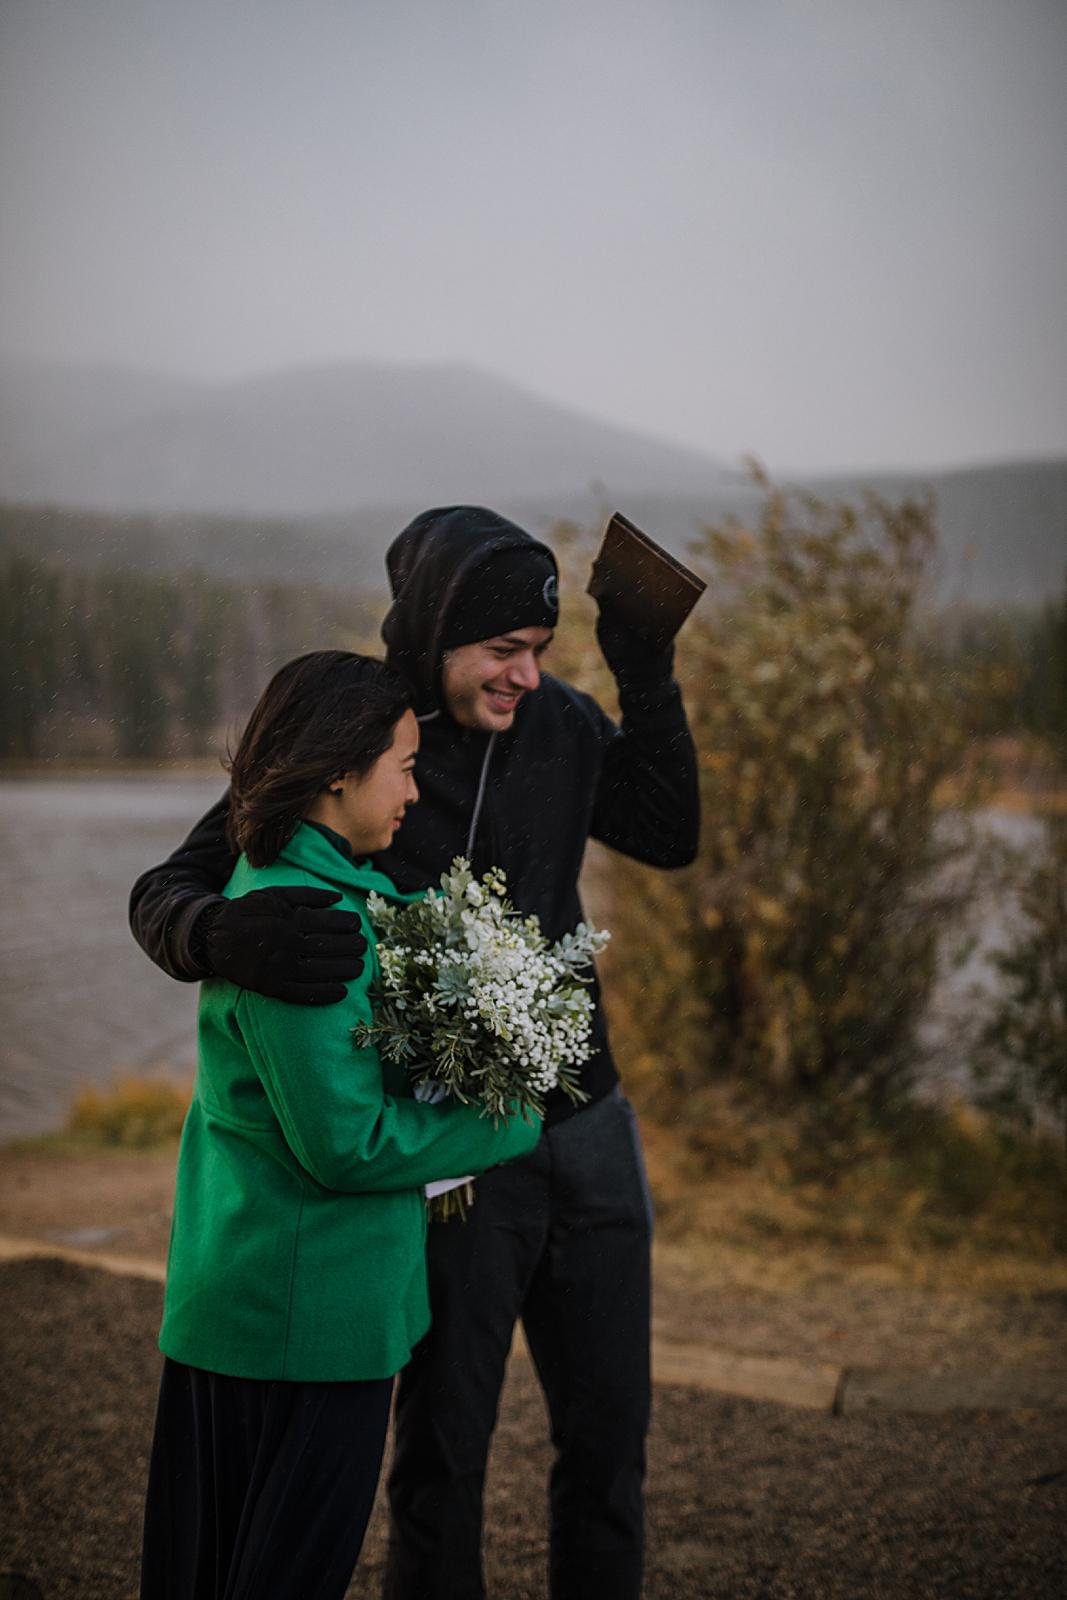 guests in the rain, sprague lake dock elopement, sunrise elopement, colorado elopement, sprague lake elopement, rocky mountain national park elopement, adventurous colorado hiking elopement